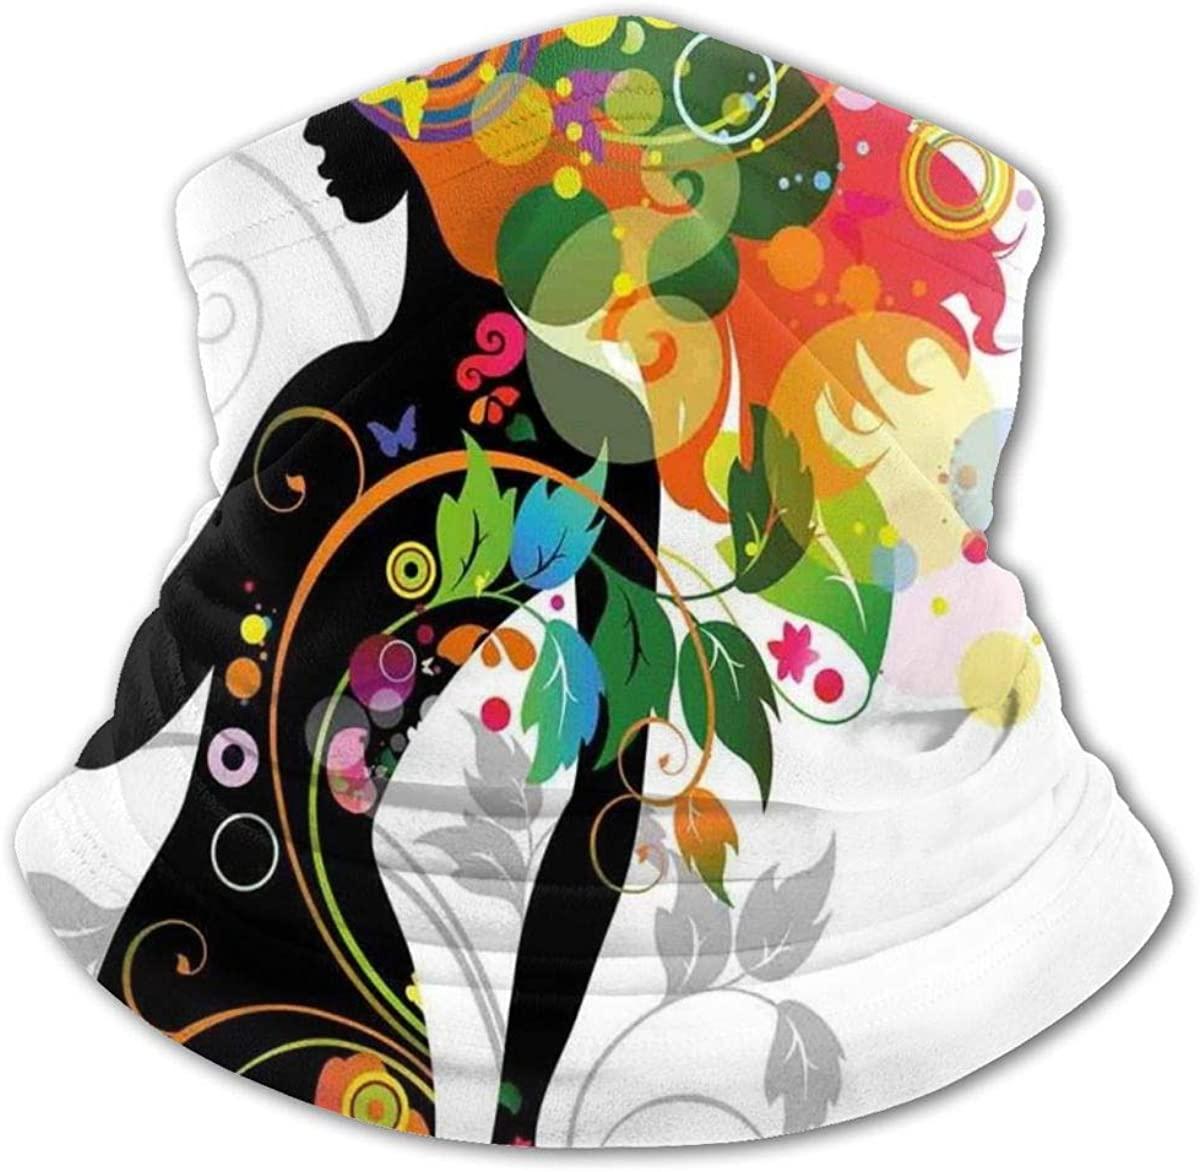 Version with Spring Spiral Circles Leaf Kids Bandanas Reusable Washable Neck Gaiter Balaclava,Half Face Protective Masks